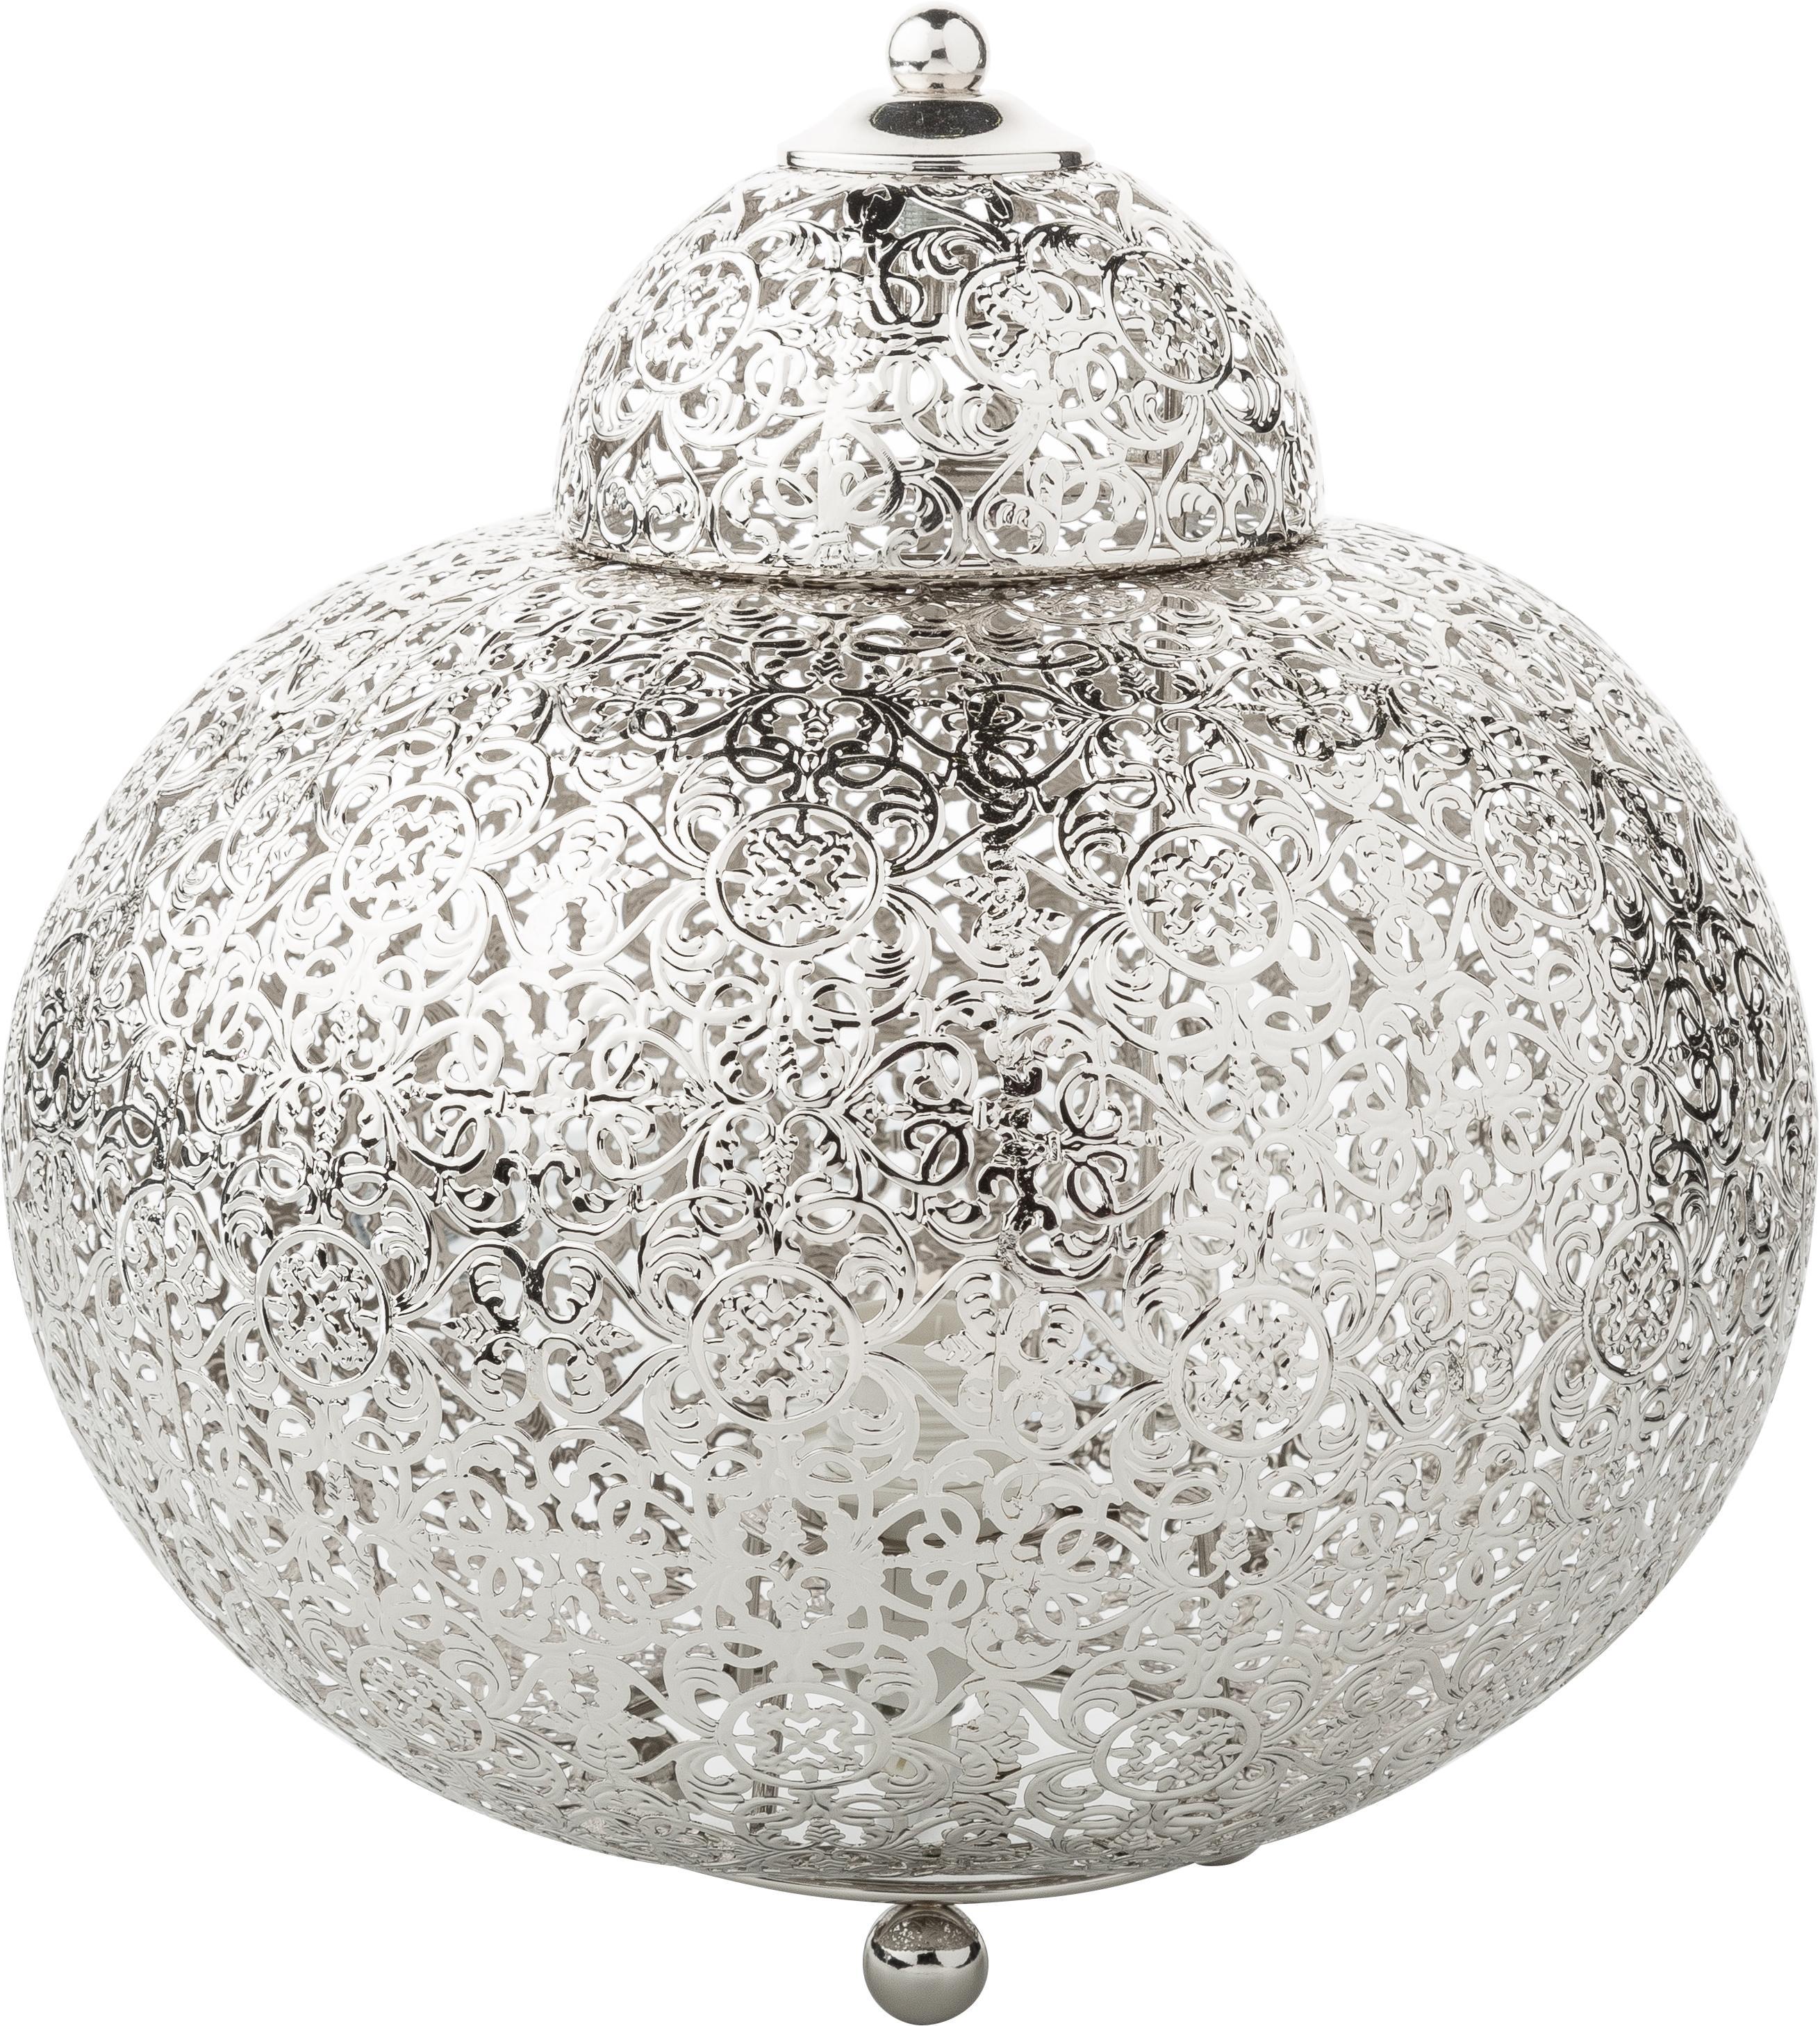 Lampada da tavolo boho Marocco, Nichel, Argento, Ø 26 x Alt. 26 cm